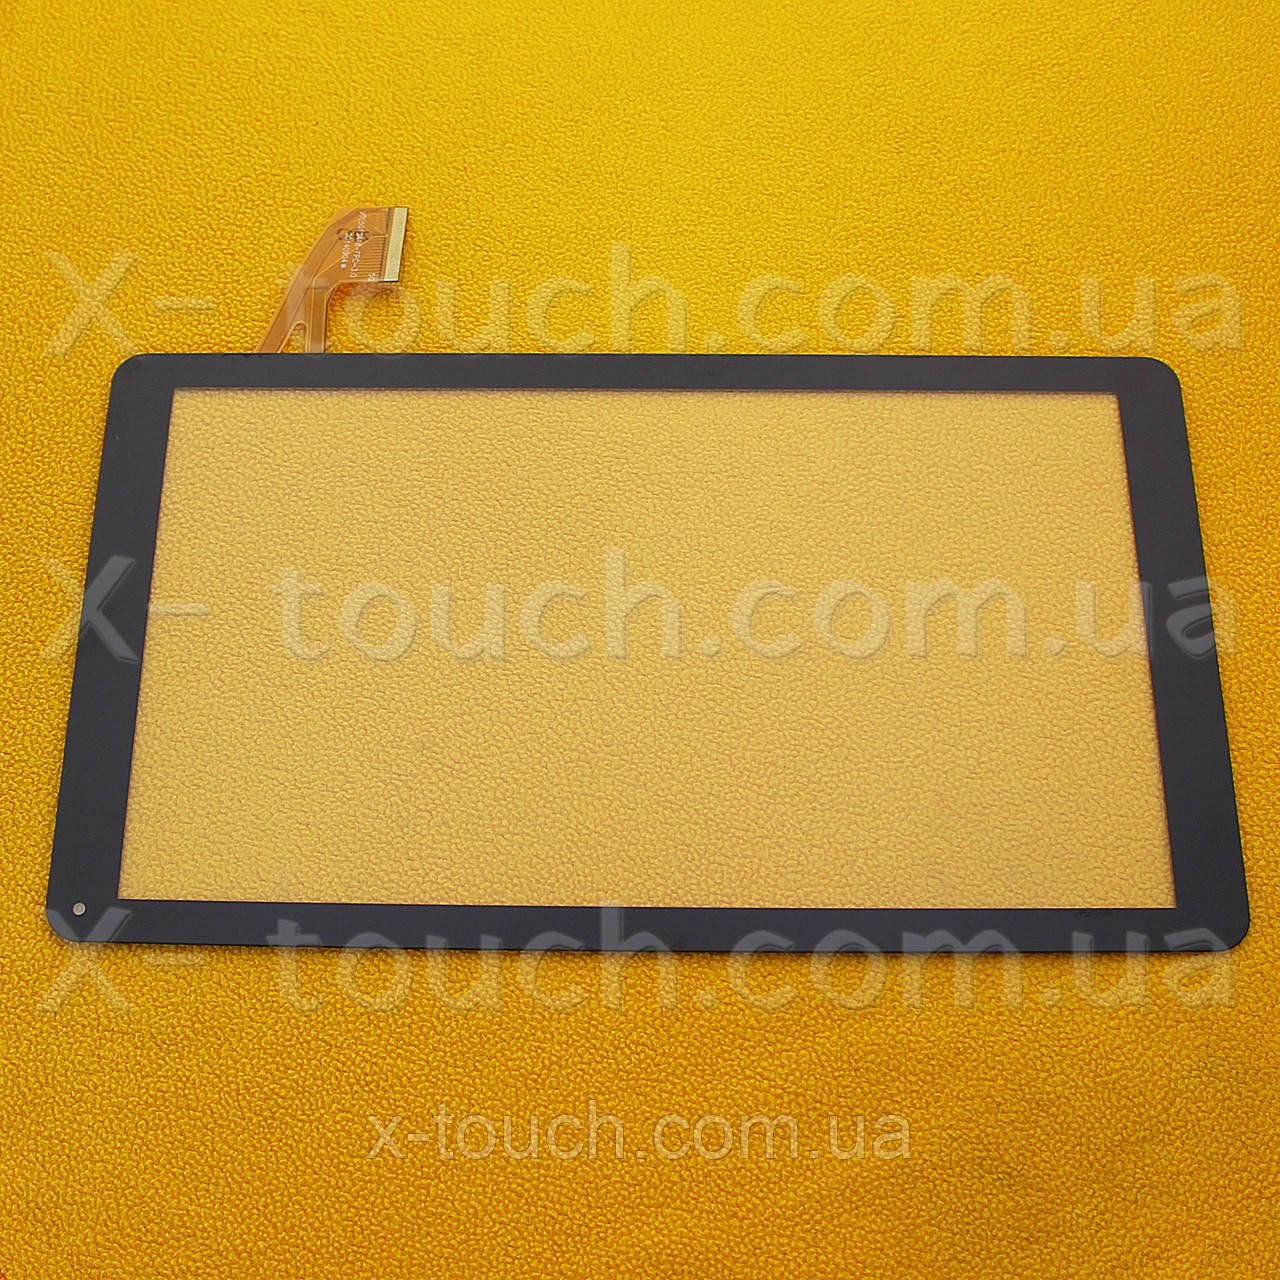 Тачскрин, сенсор  DH-1047A1-FPC164-V2.0  для планшета